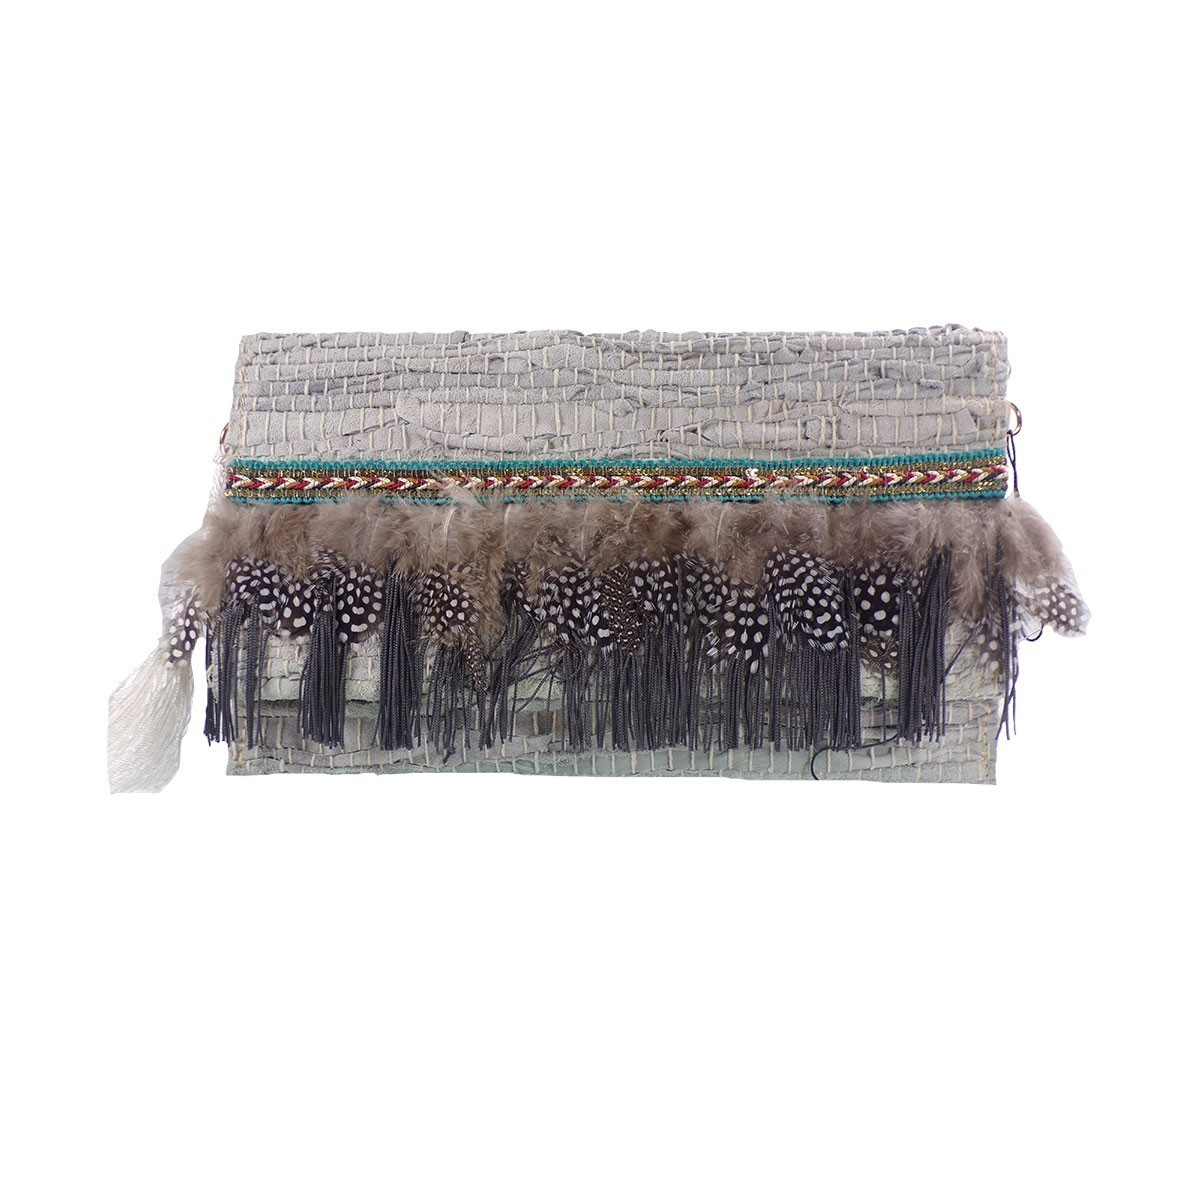 Exe Bags Γυναικεία Τσάντα Φάκελος 781 Πάγος- Μπέζ